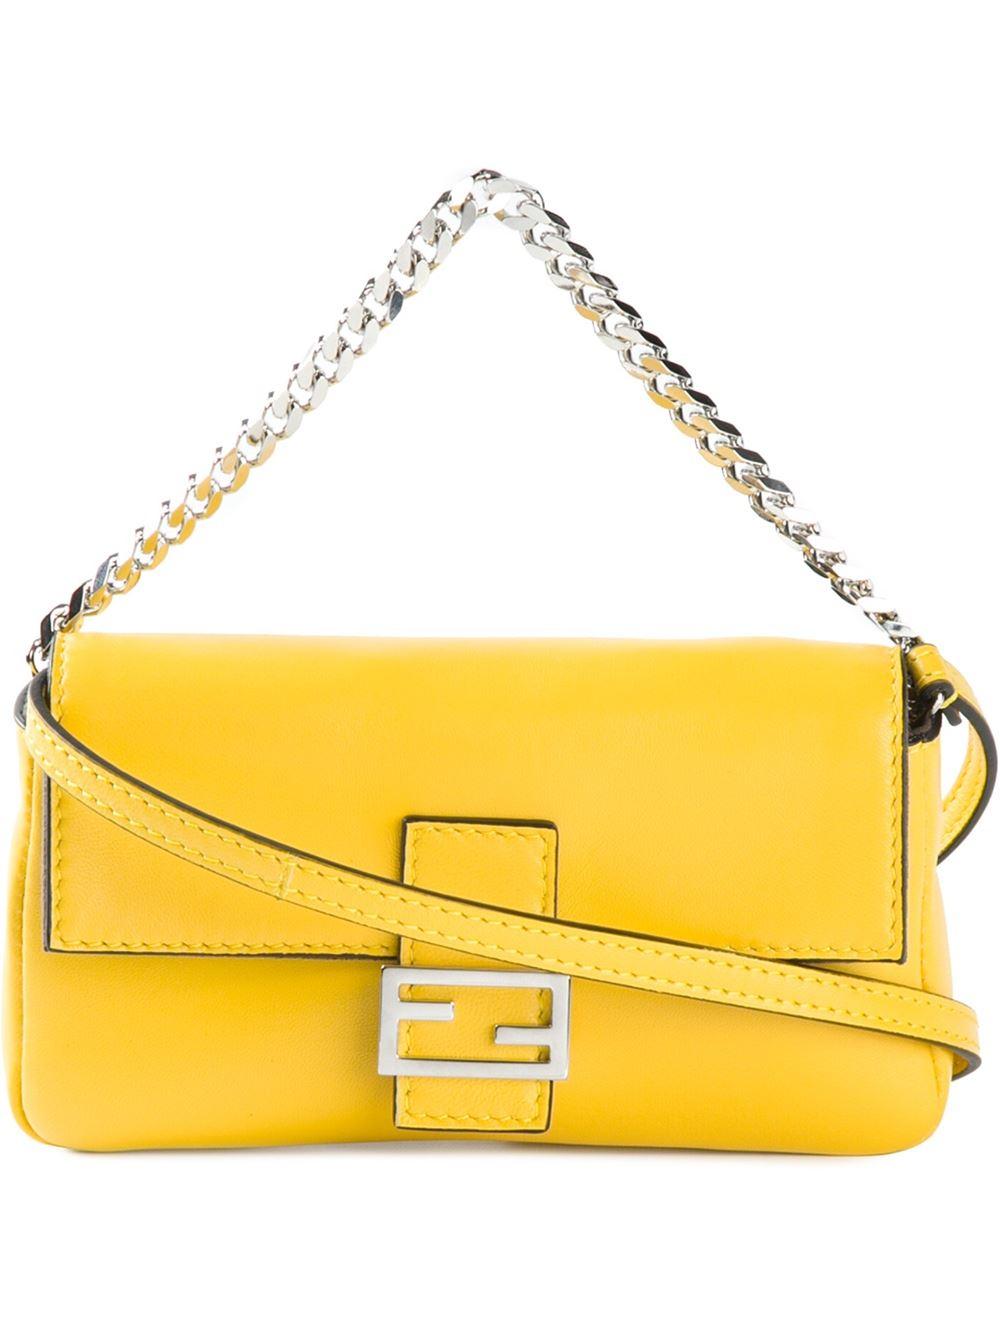 Fendi Baguette Micro Calf Leather Shoulder Bag in Yellow | Lyst